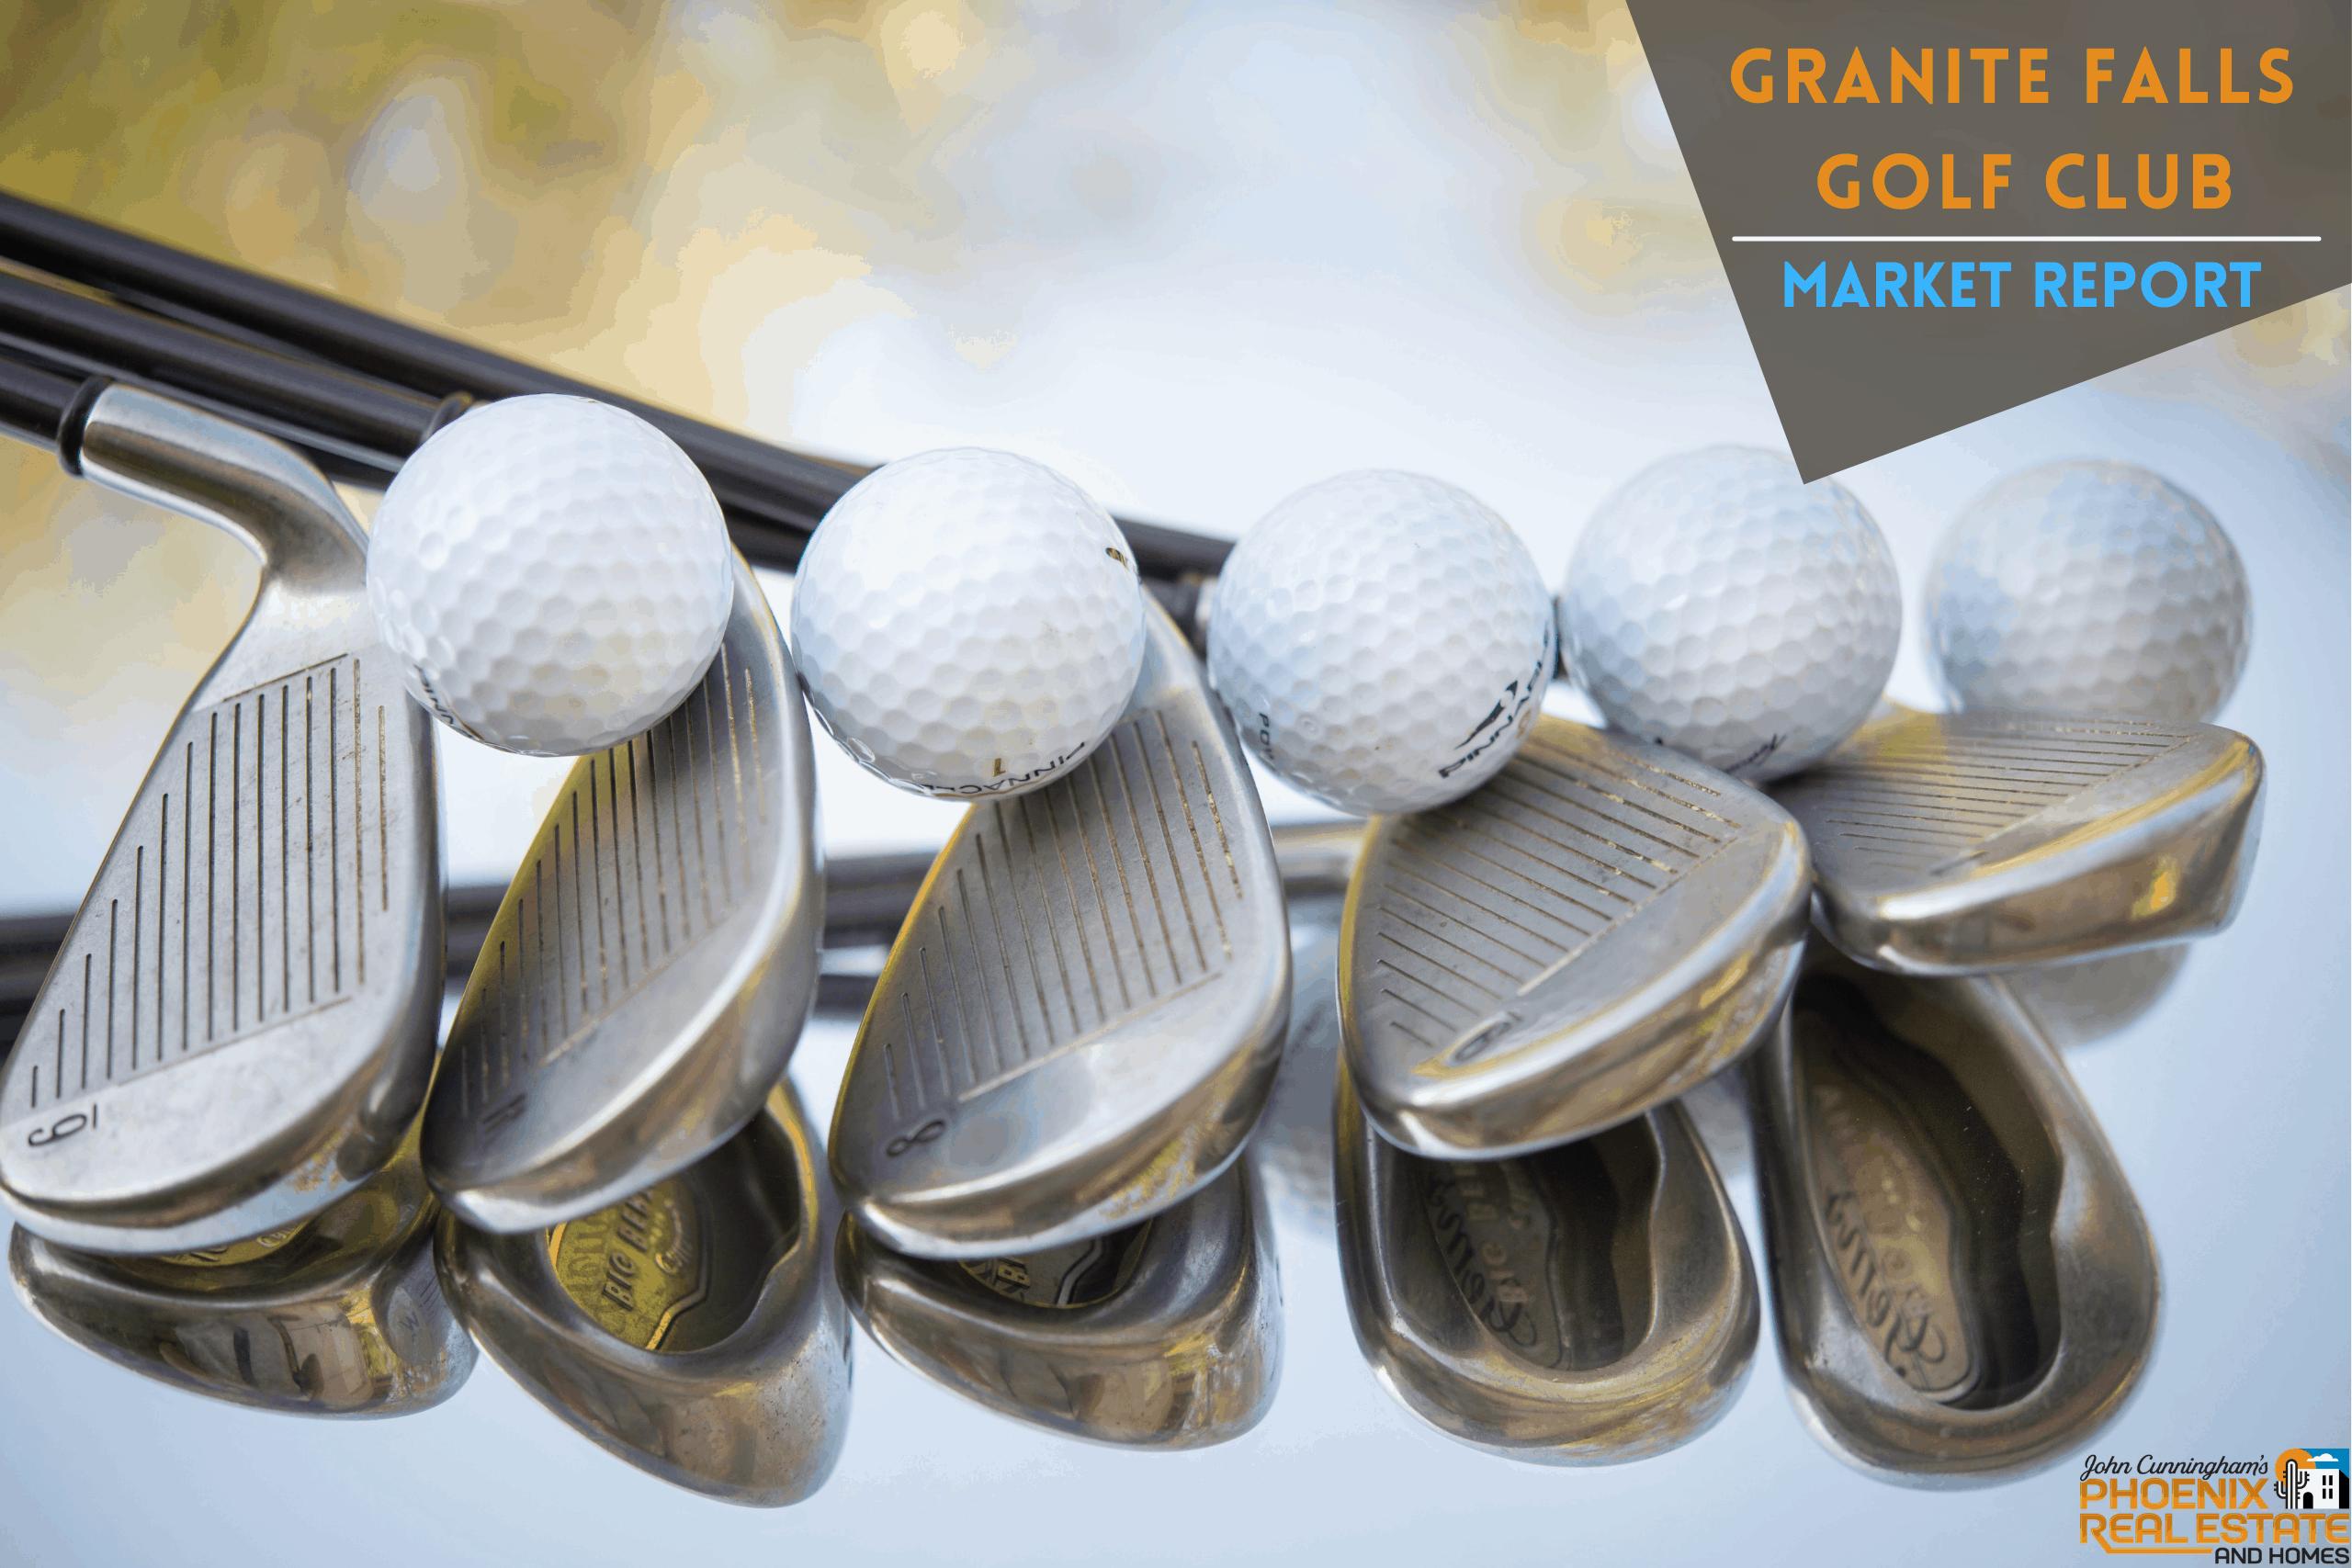 Granite Falls Golf Club Market Report